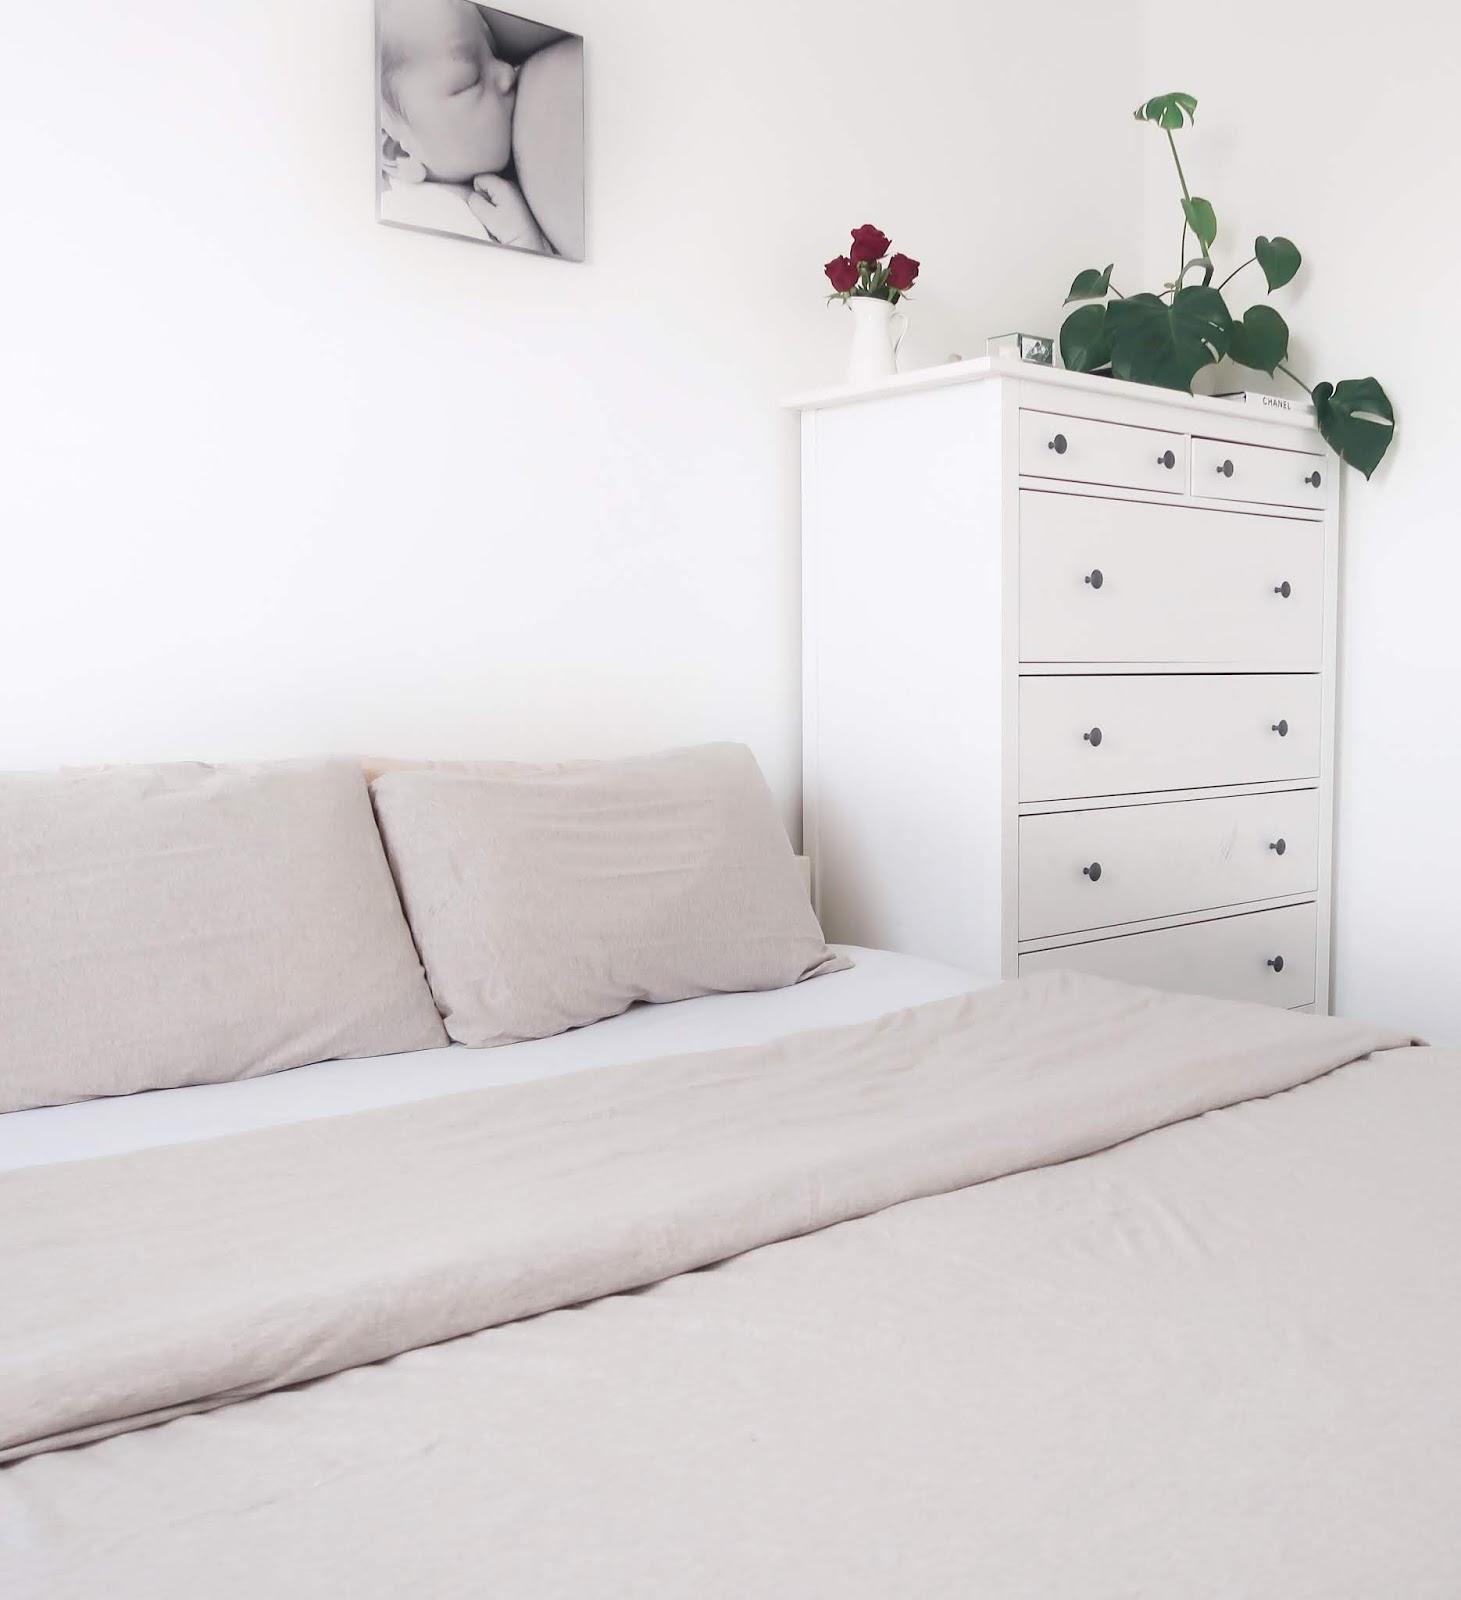 ECOSOPHY: Organic cotton jersey bedding